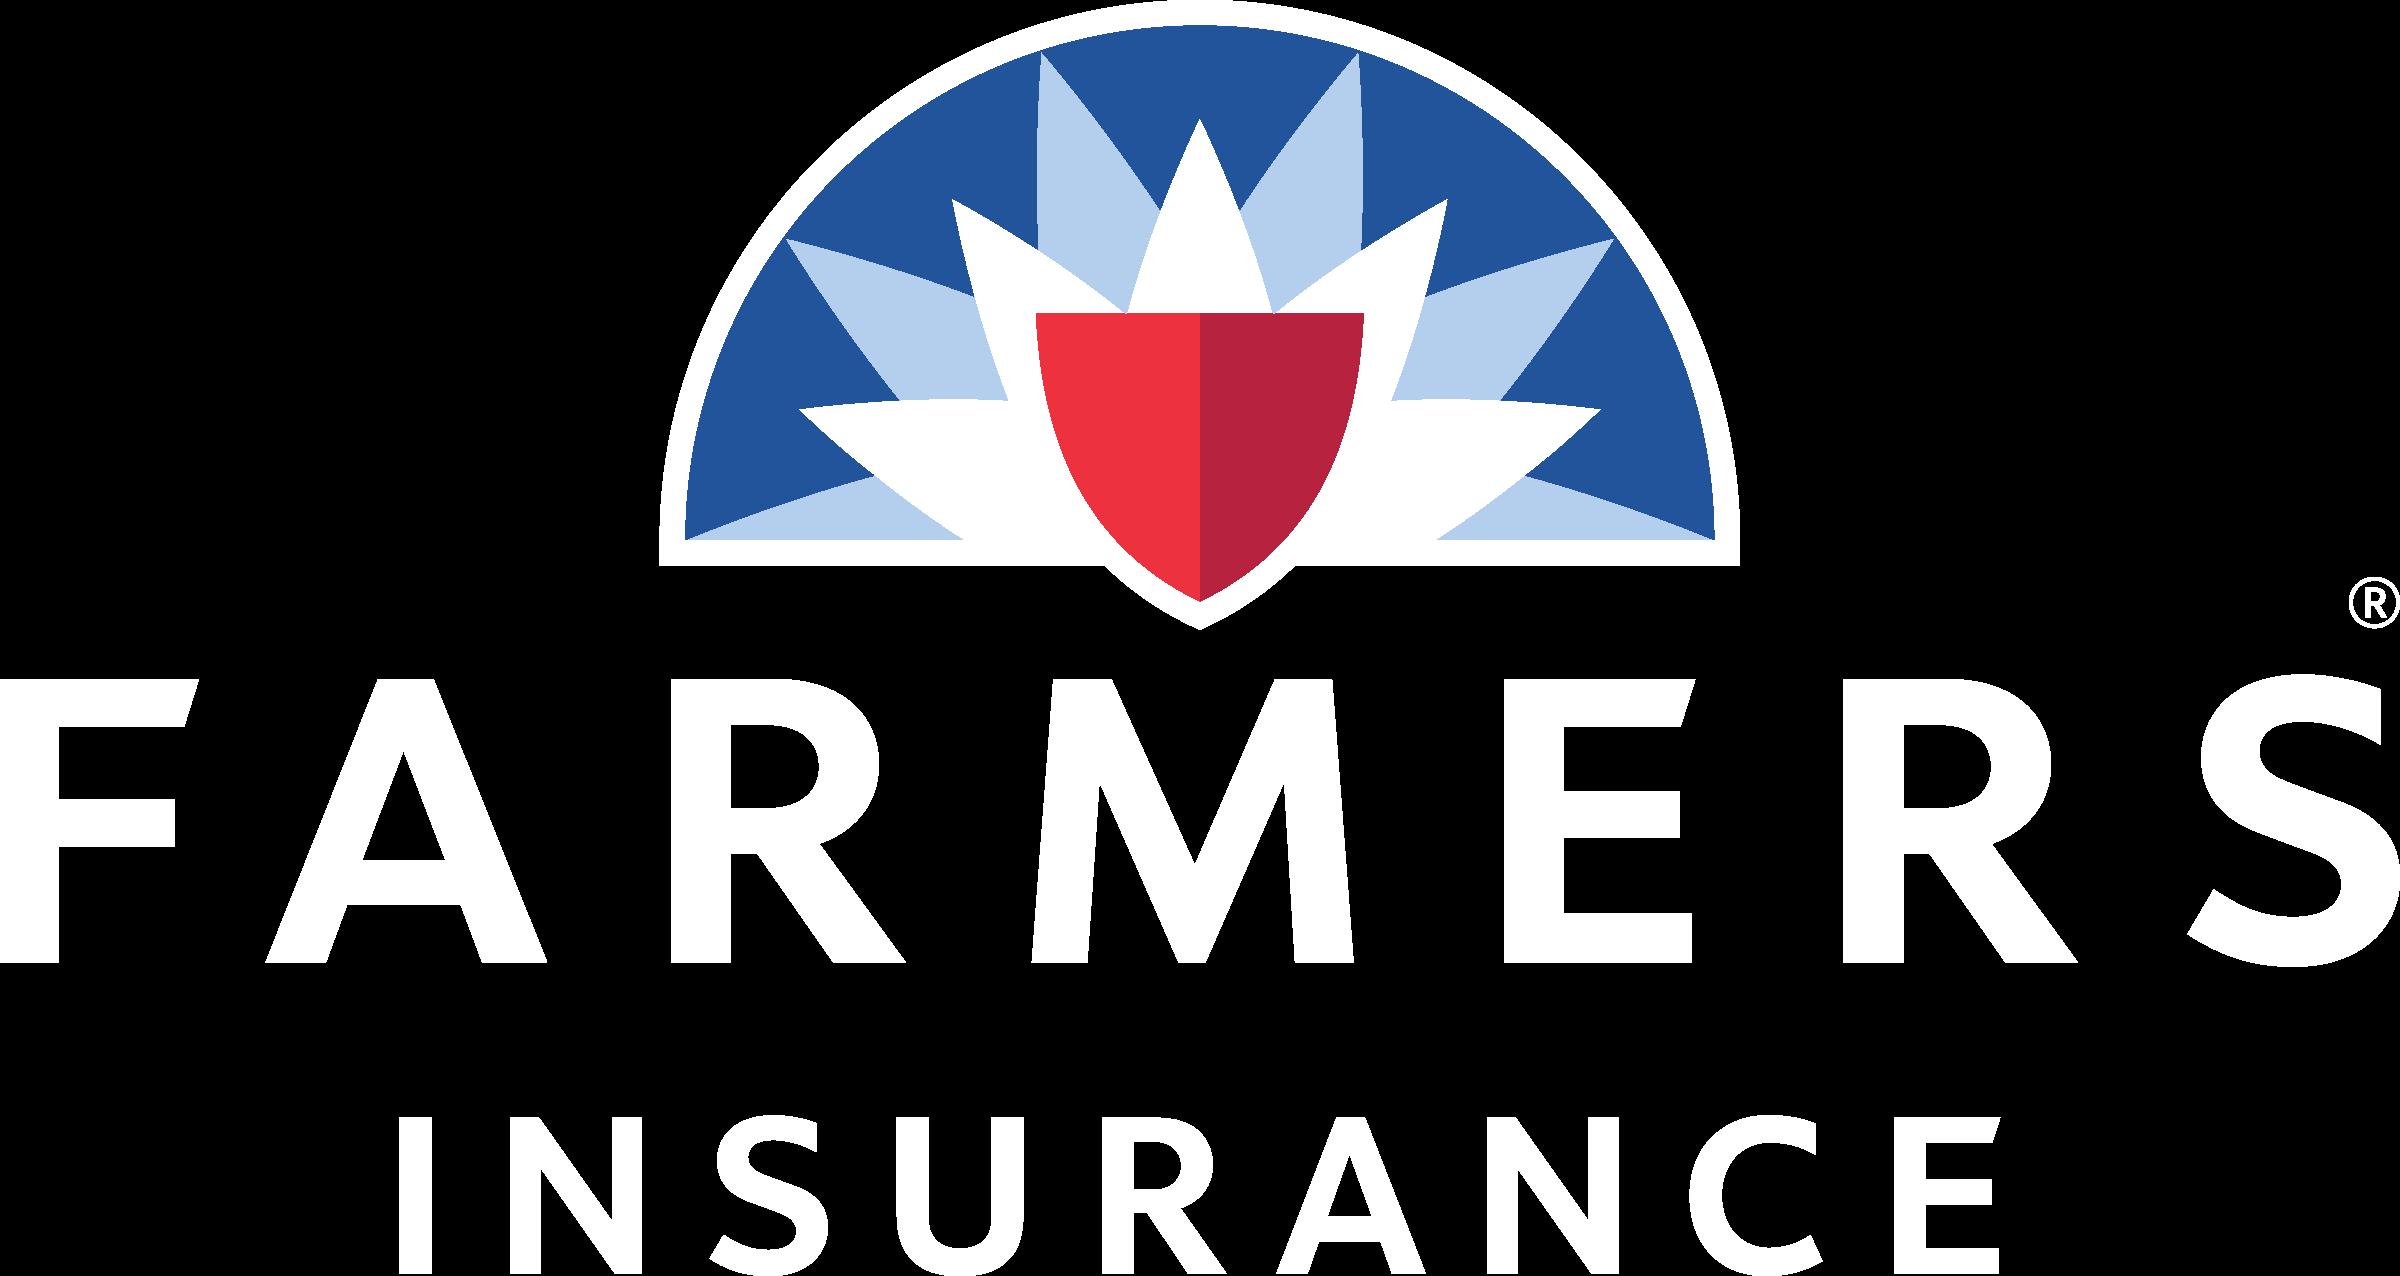 farmers-insurance.png